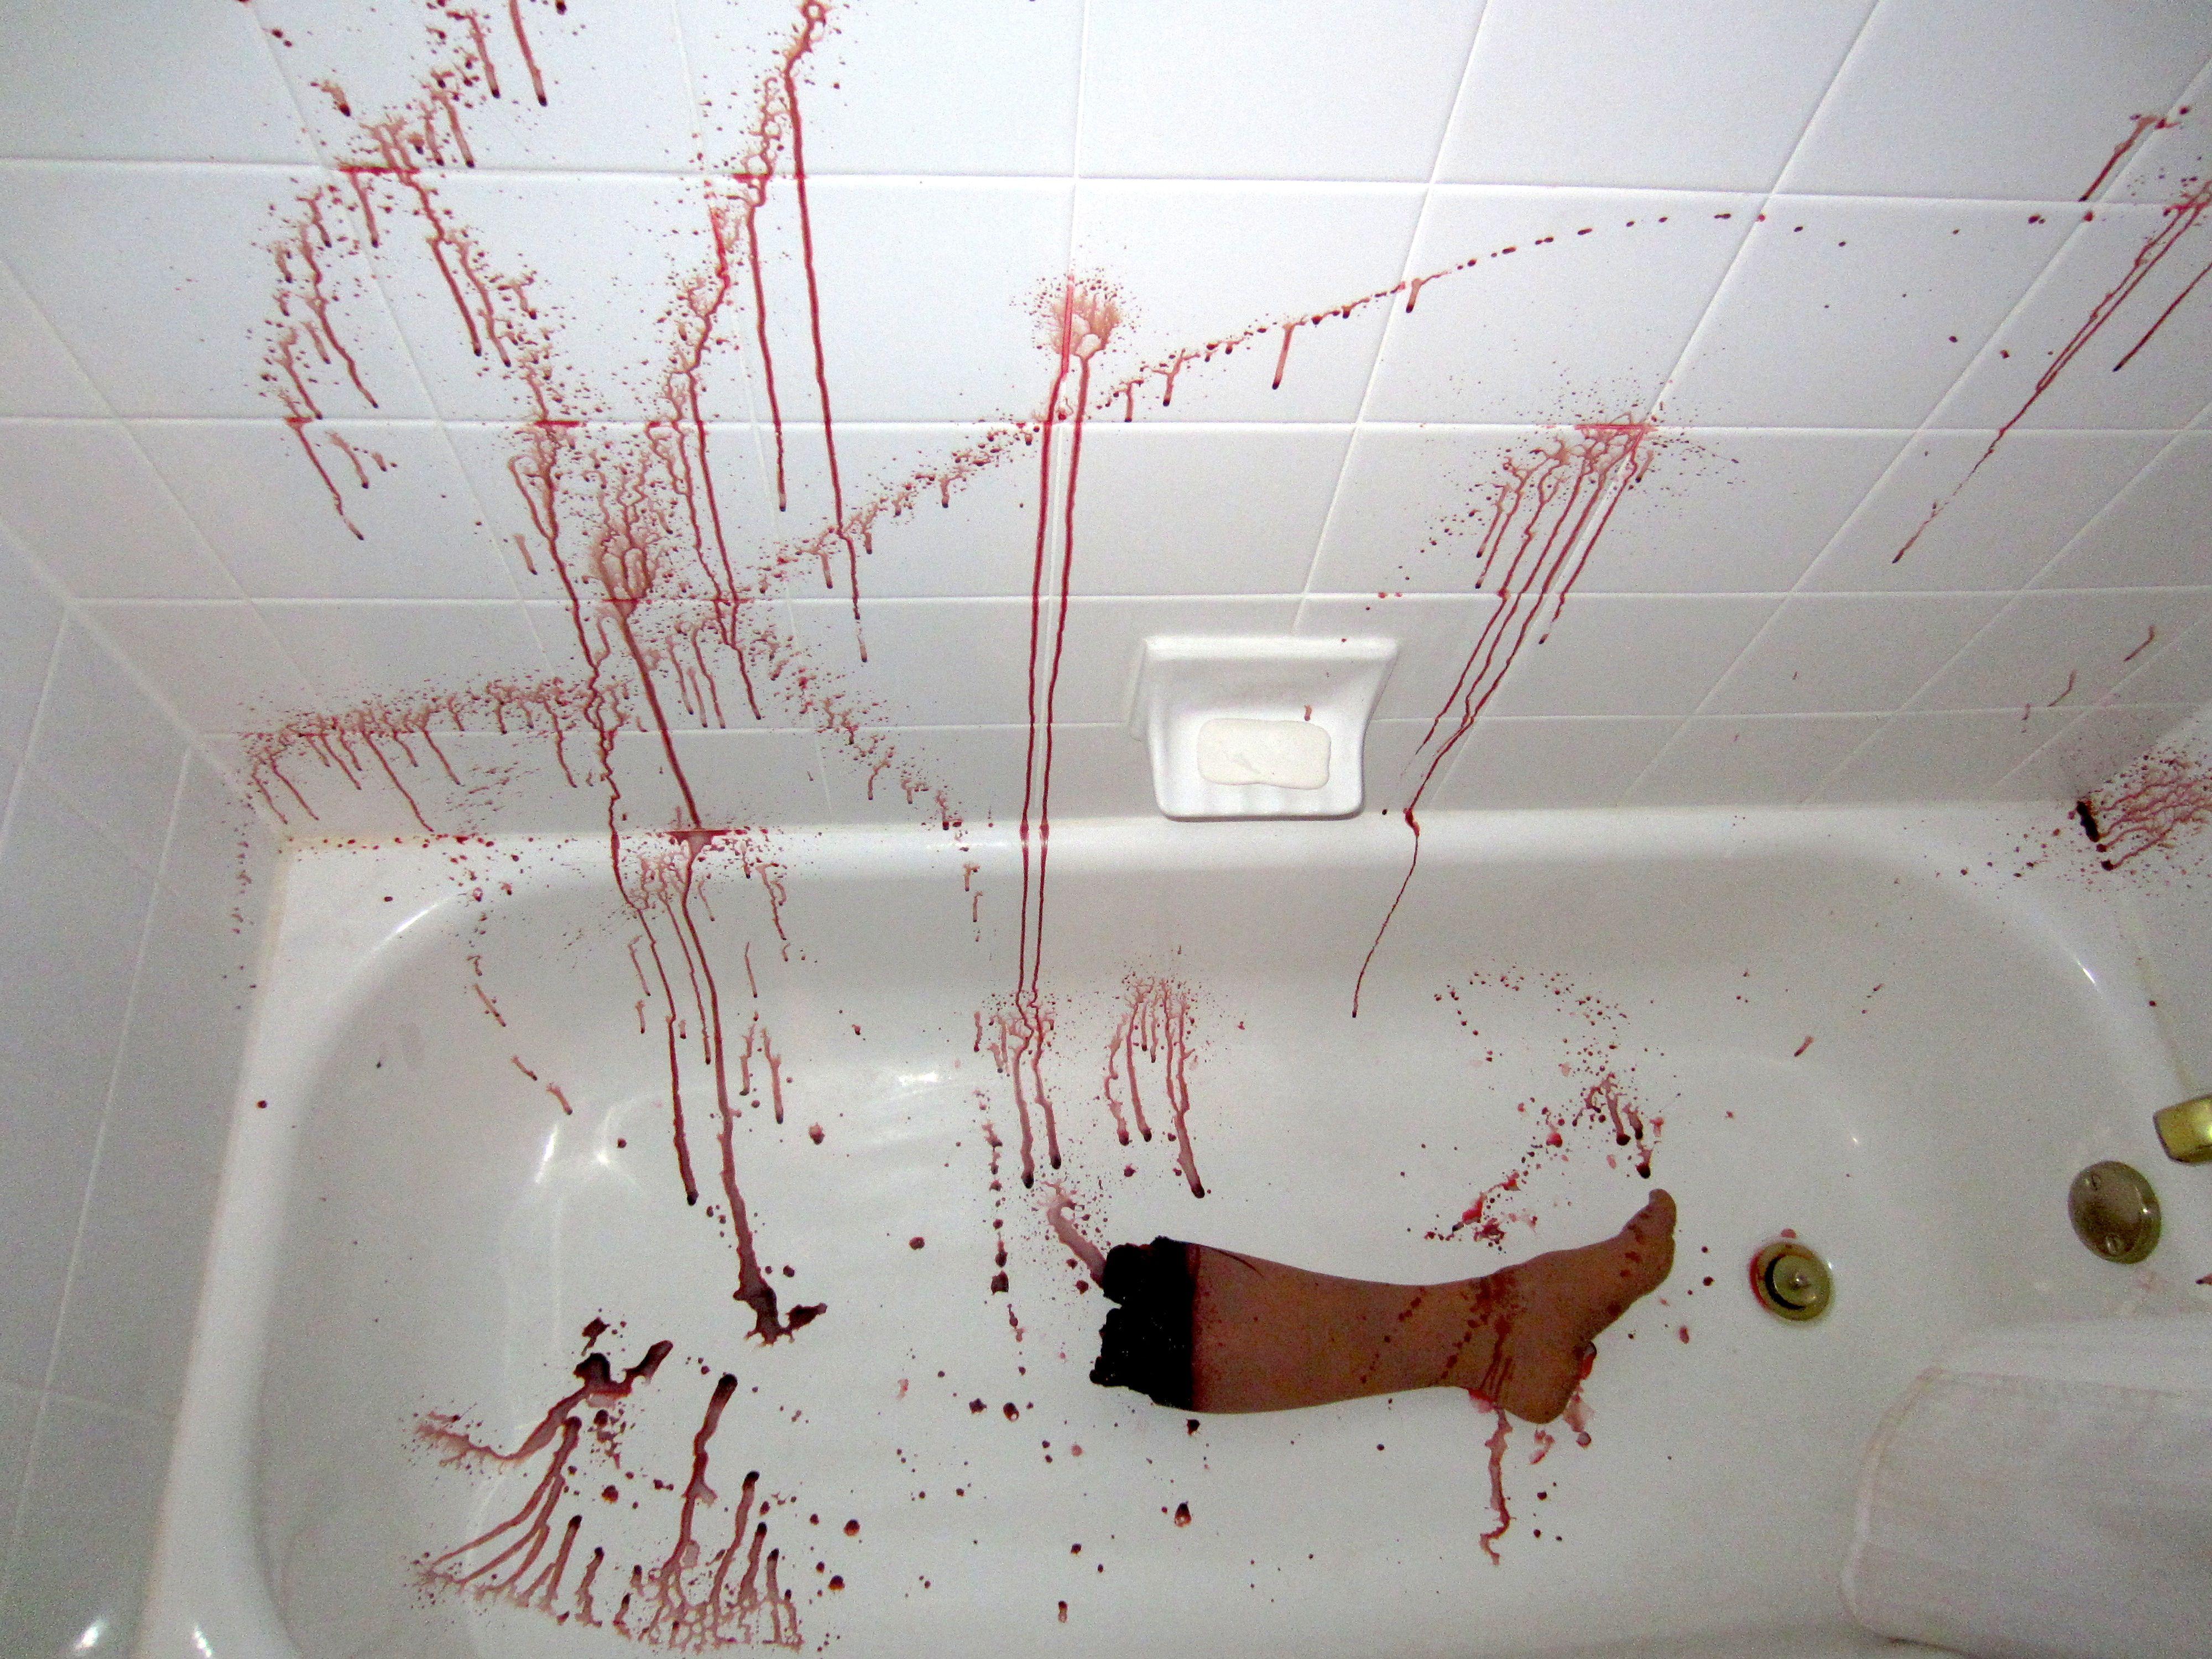 Spectacular Halloween Party Decor Bloody bathtub